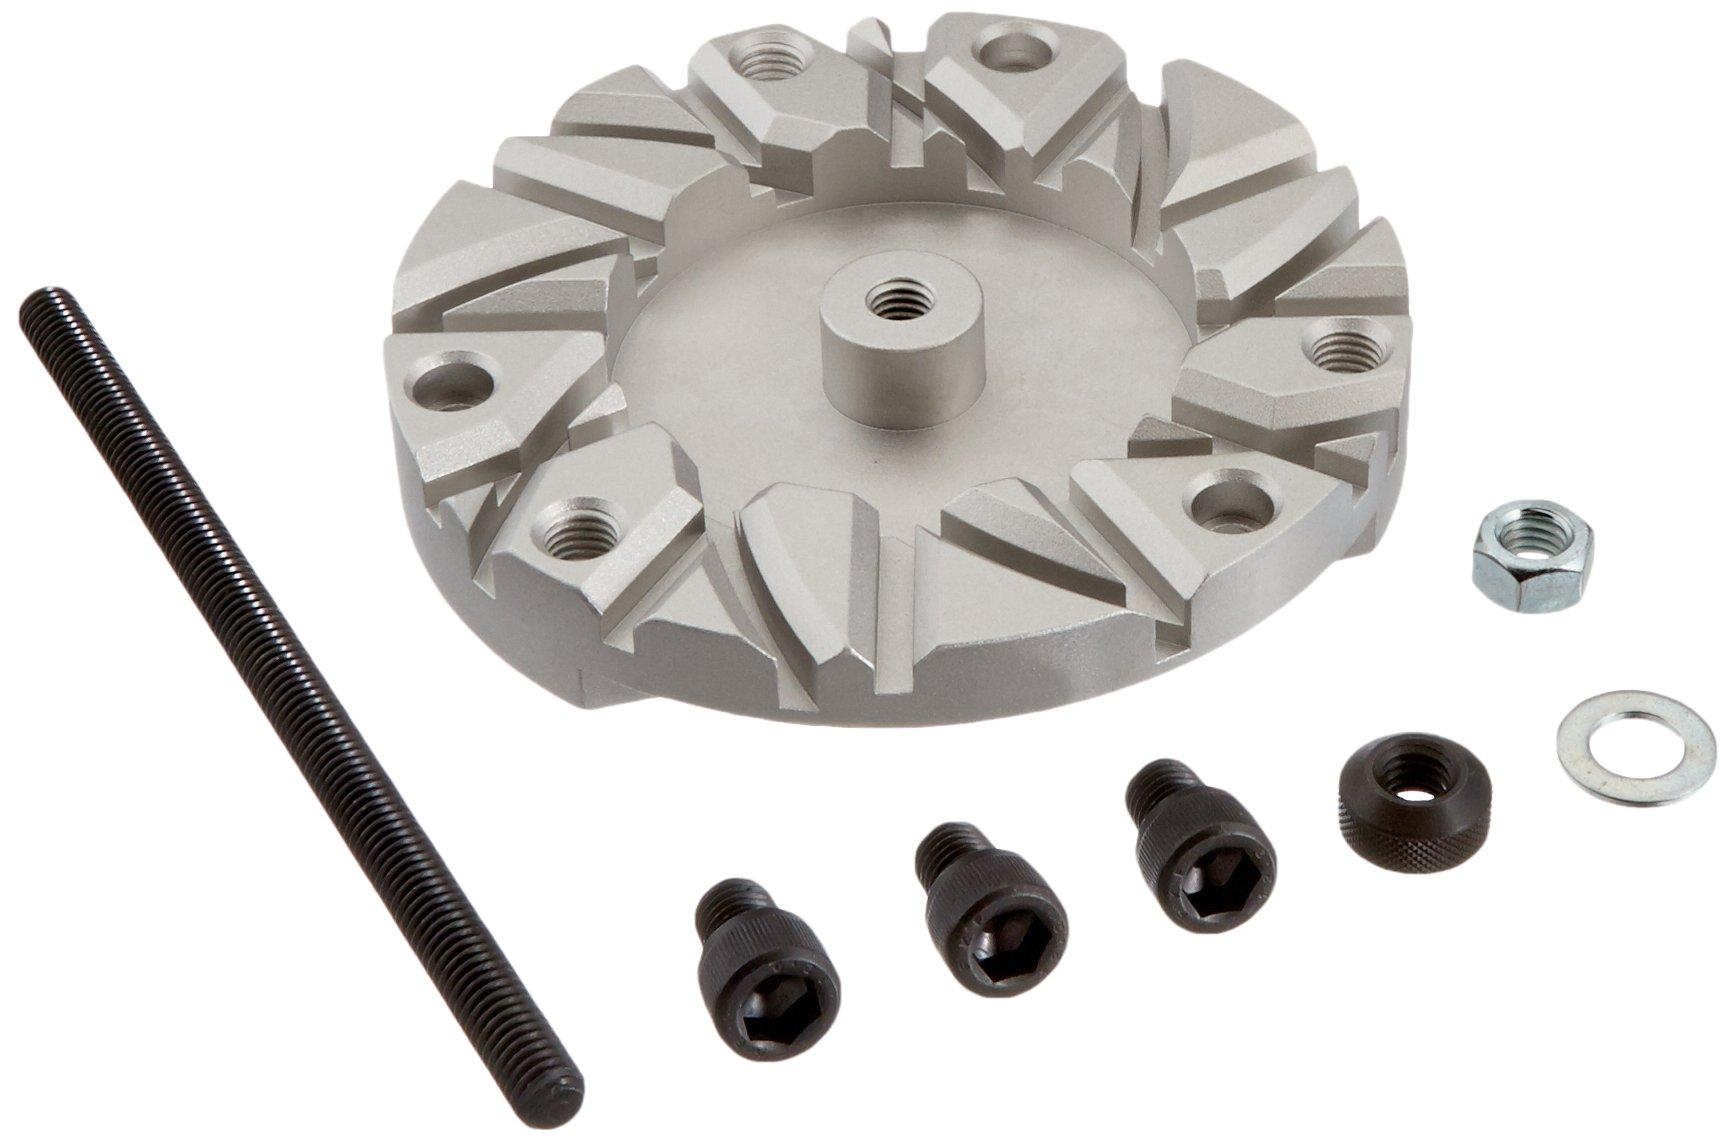 OTC Tools 4972 Drive Clutch Holding Fixture by OTC (Image #1)